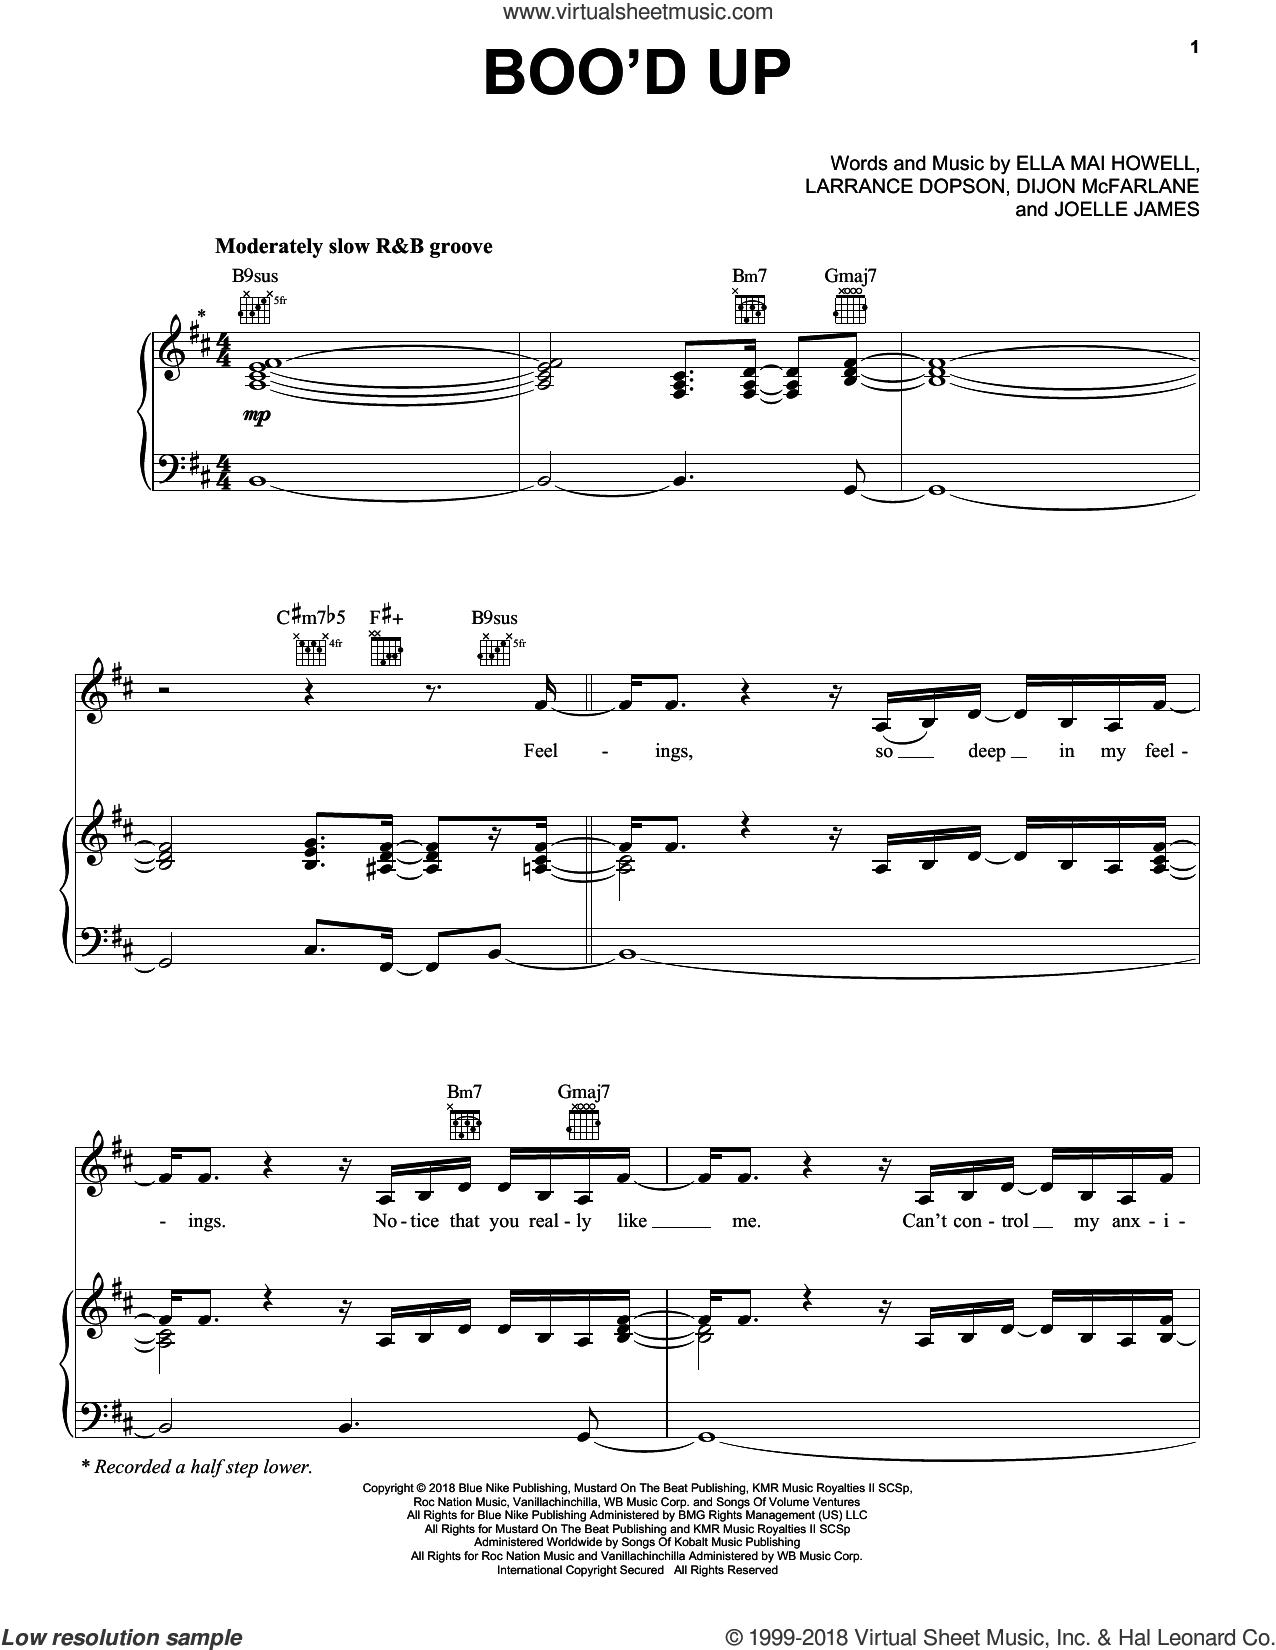 Boo'd Up sheet music for voice, piano or guitar by Ella Mai, Ella Mai feat. DJ Mustard, Dijon McFarlane, Ella Mai Howell, Joelle James and Larrance Dopson, intermediate skill level